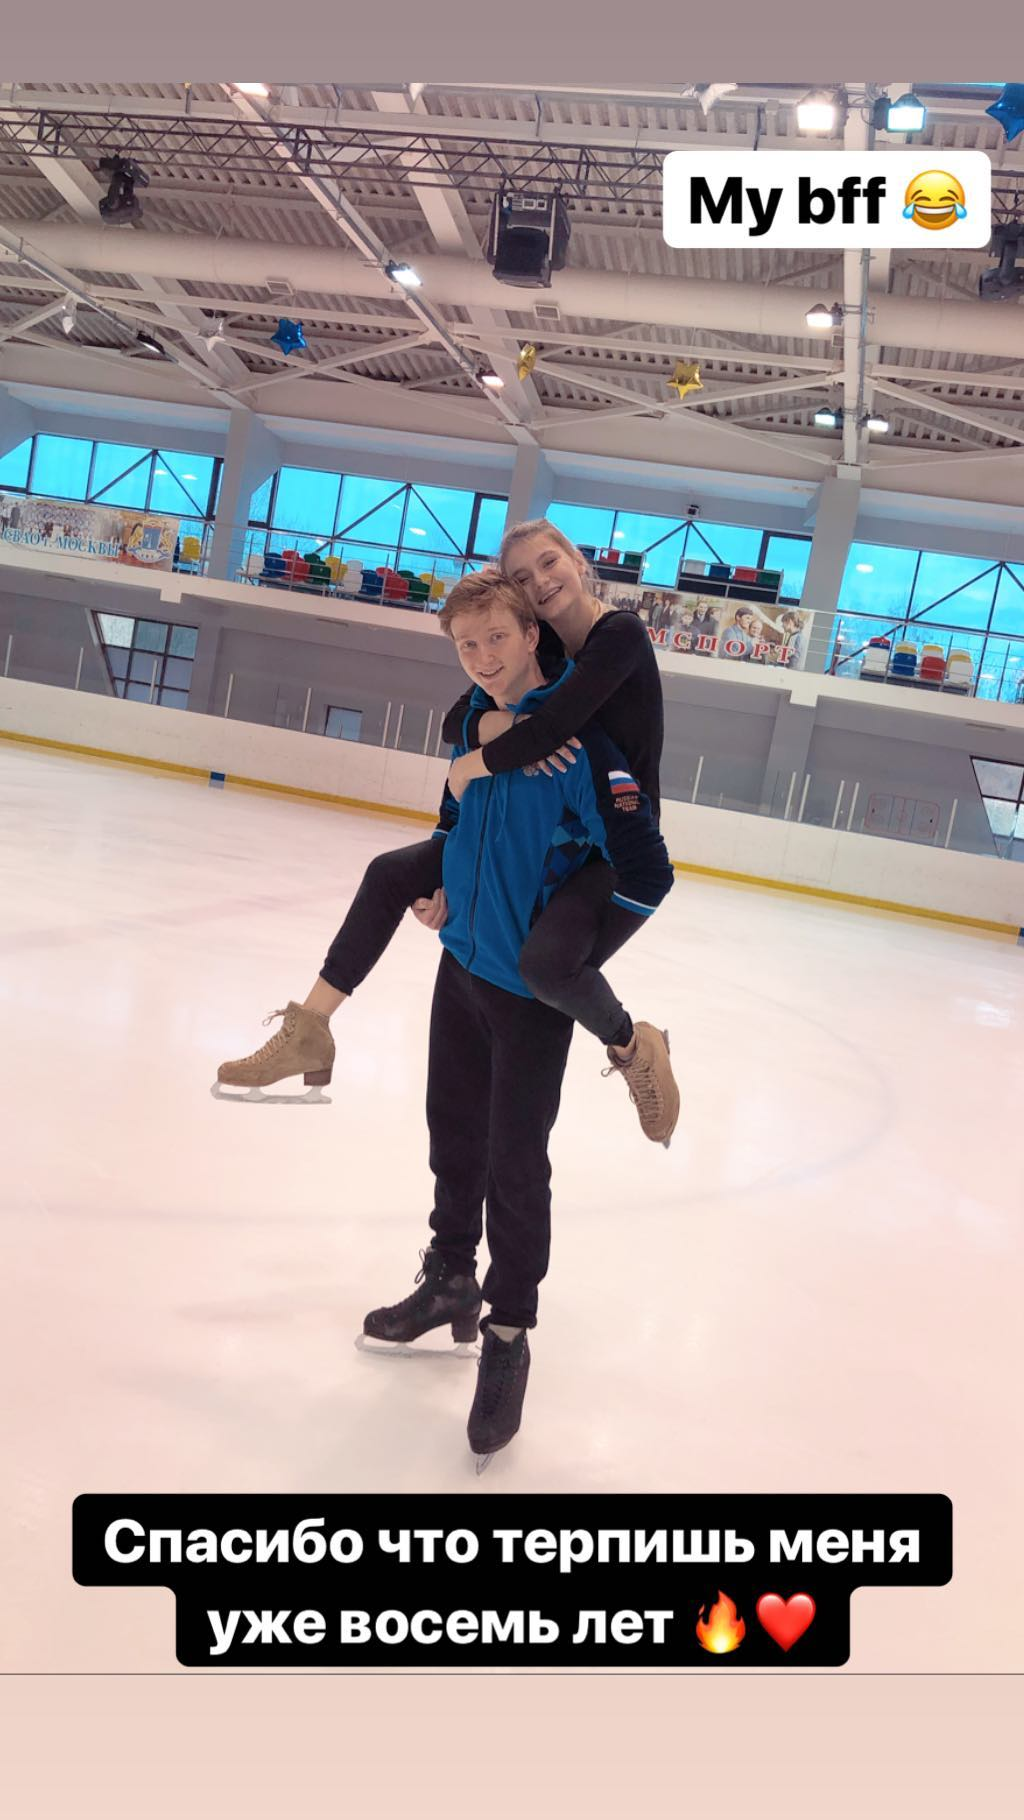 Анастасия Скопцова-Кирилл Алешин/танцы на льду - Страница 11 JFuNSrsFiZo